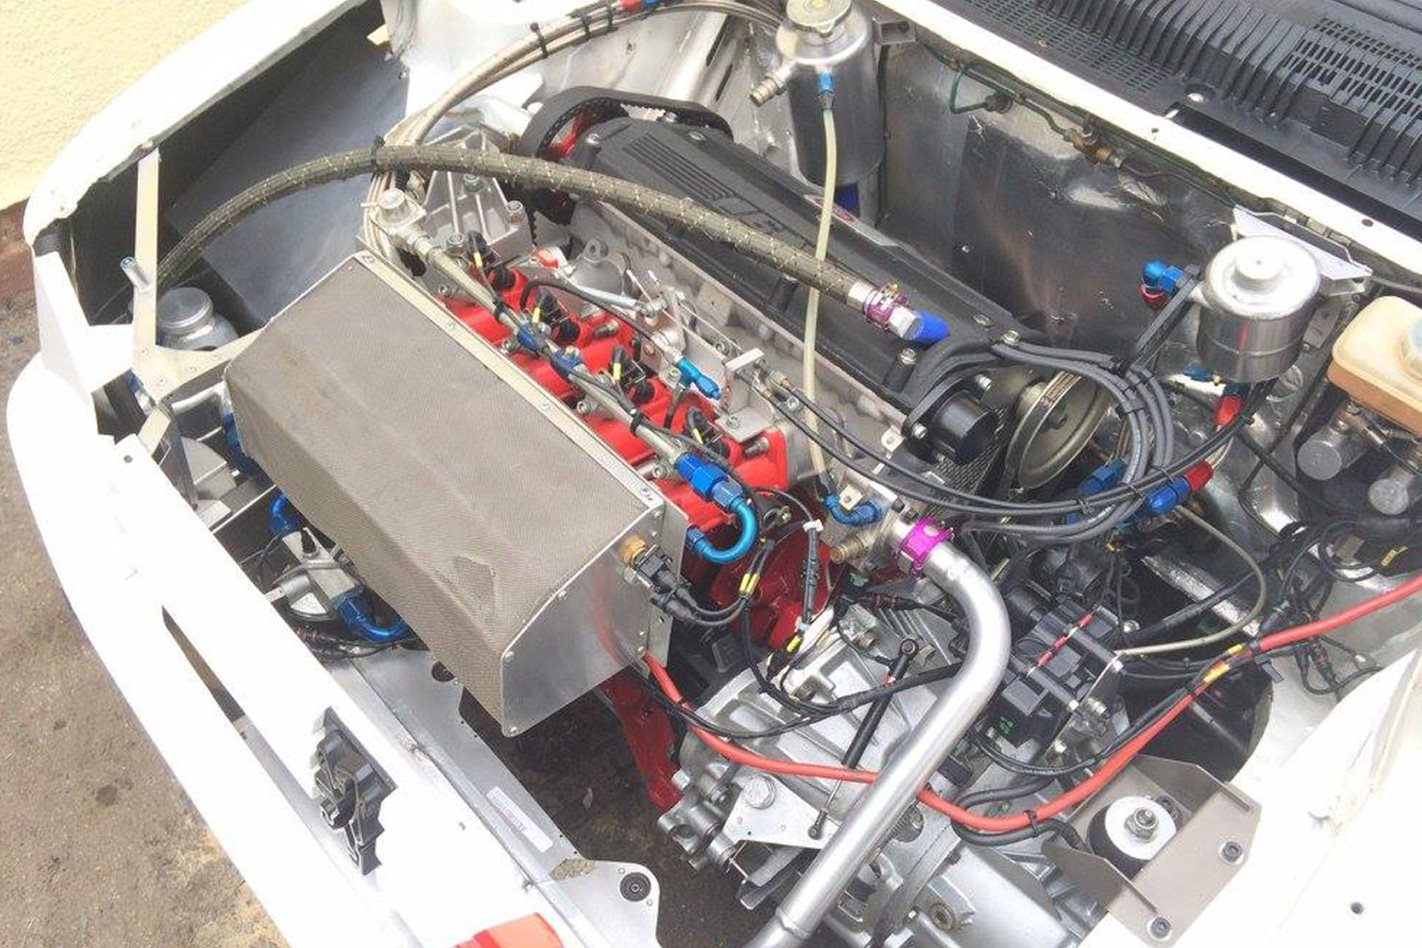 Peugeot 205 built by F1 engine